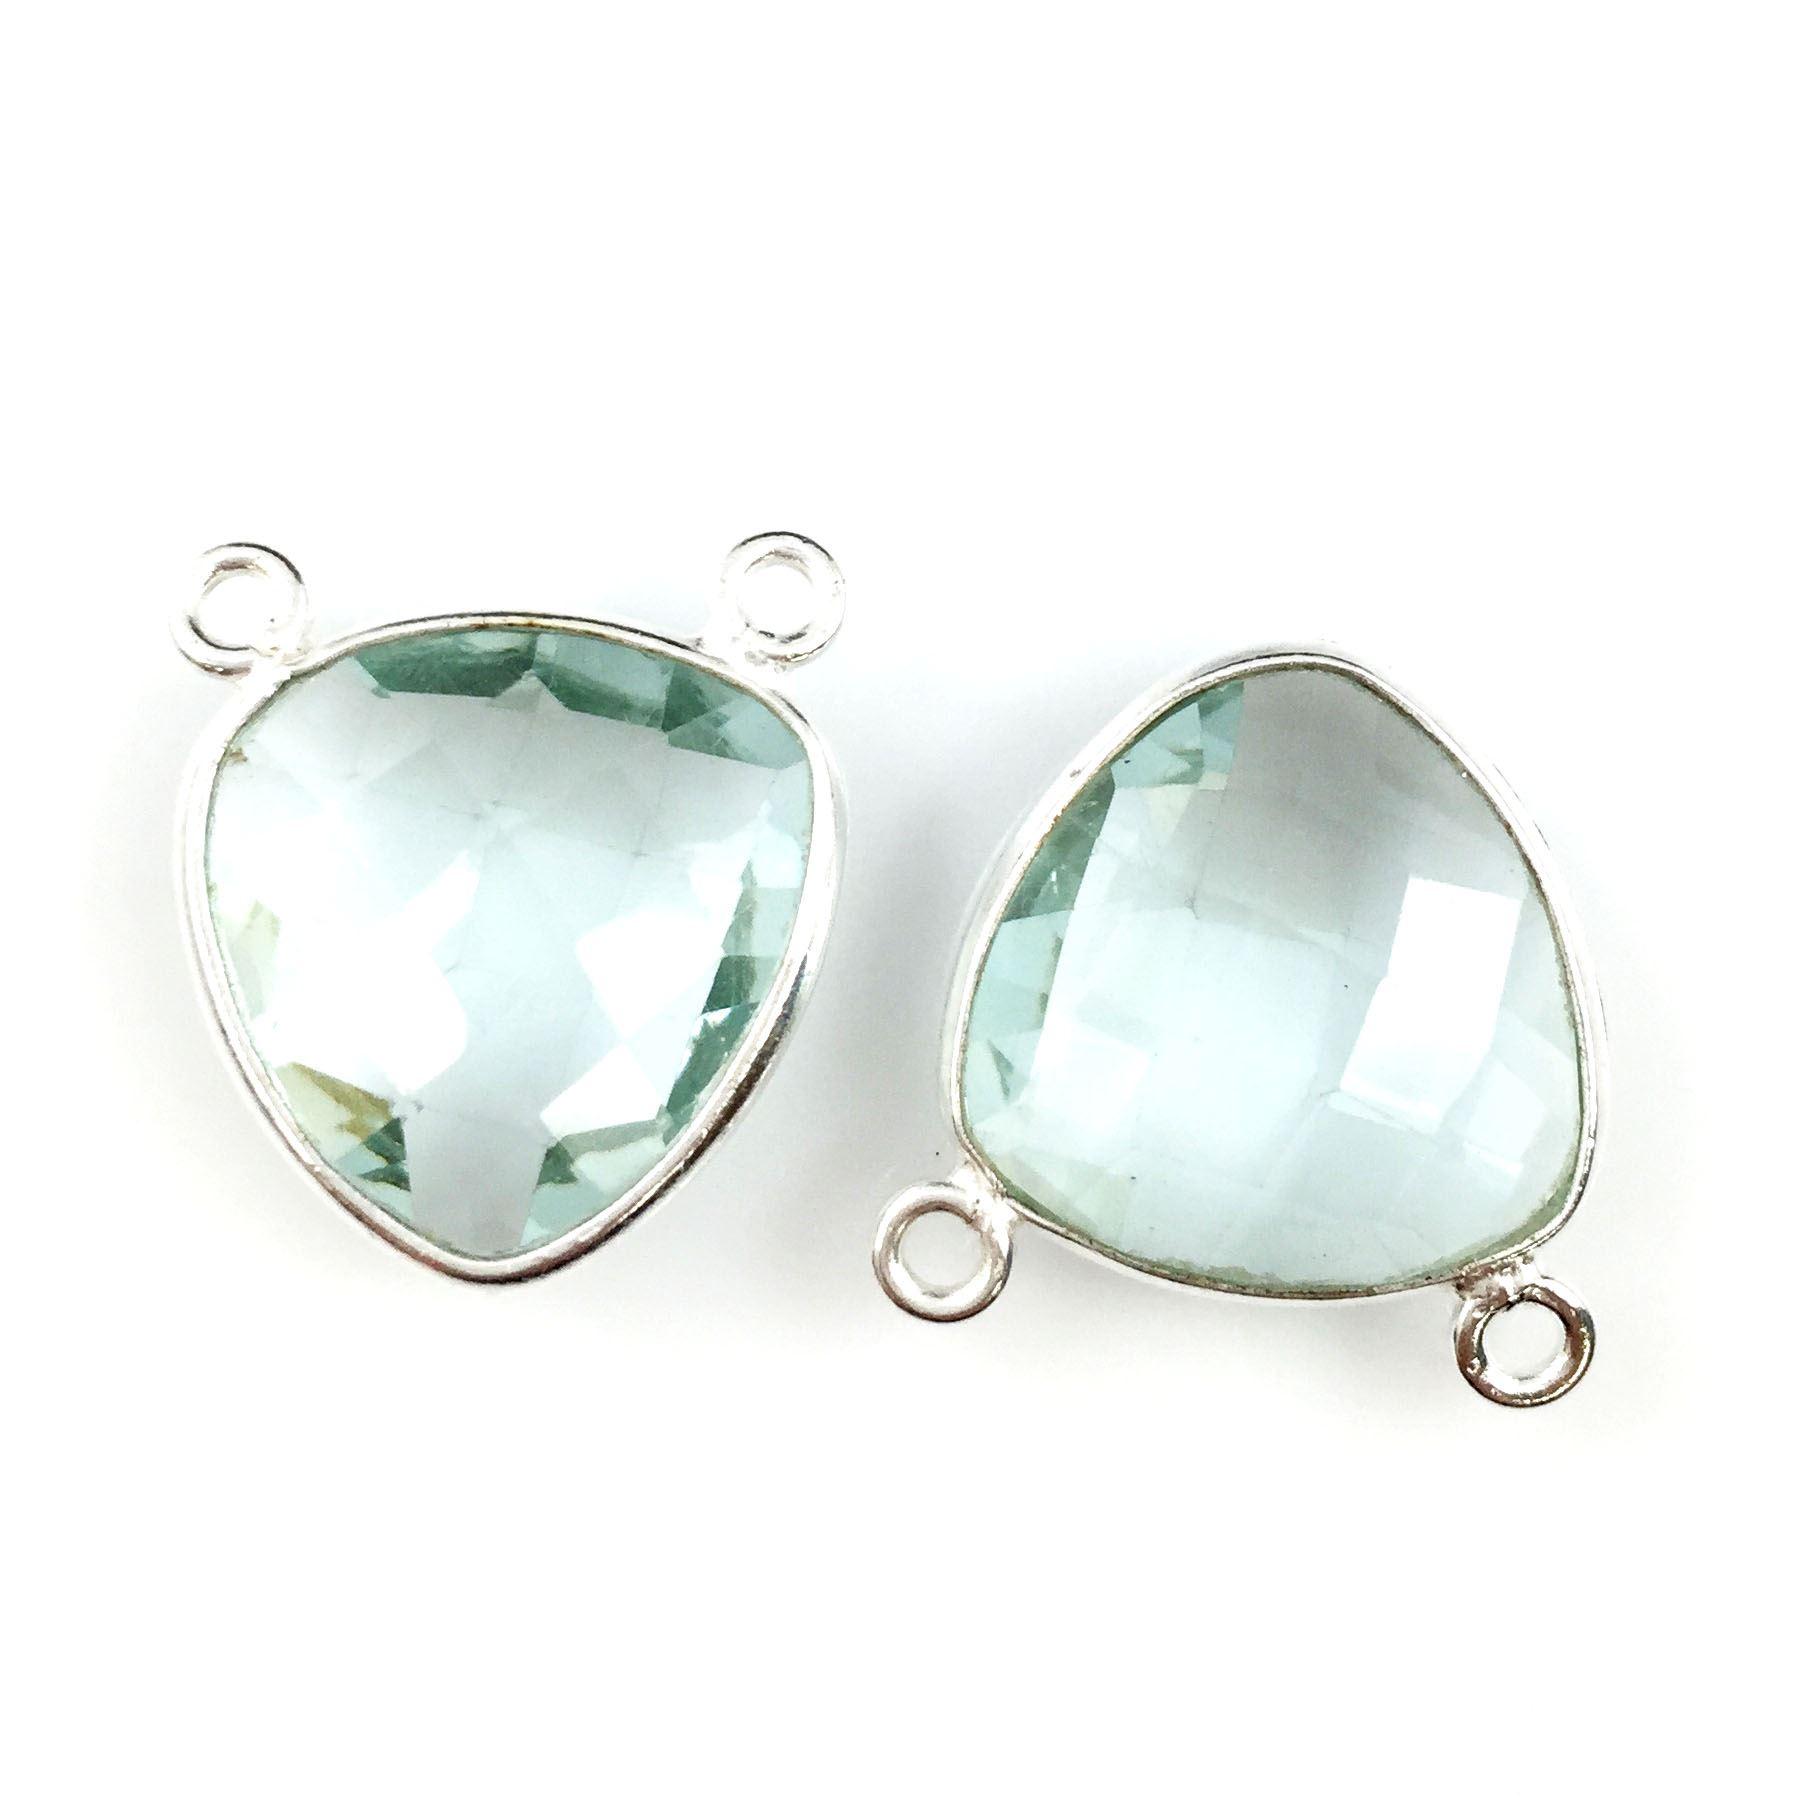 Bezel Gemstone Connector Pendant - Aqua Quartz - Sterling Silver - Small Trillion Shaped Faceted - 15mm - 1 piece